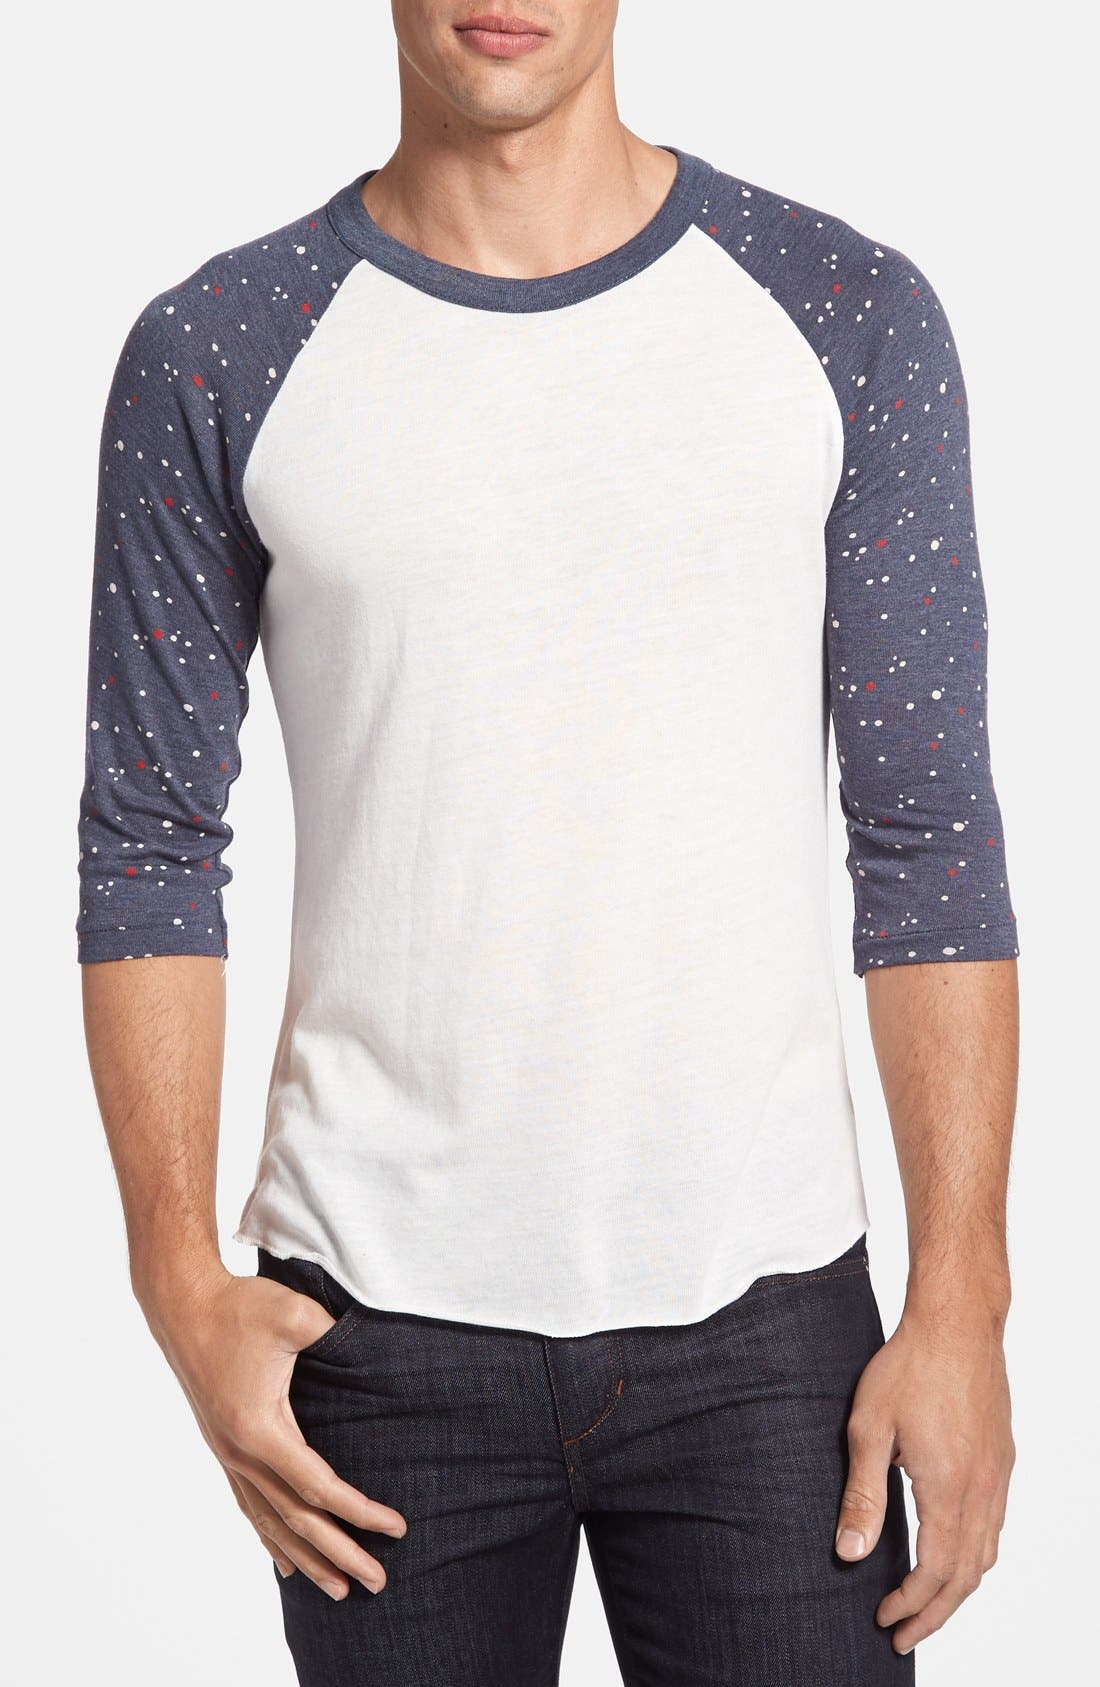 Main Image - Alternative 'USA Capsule Collection' Raglan Baseball T-Shirt